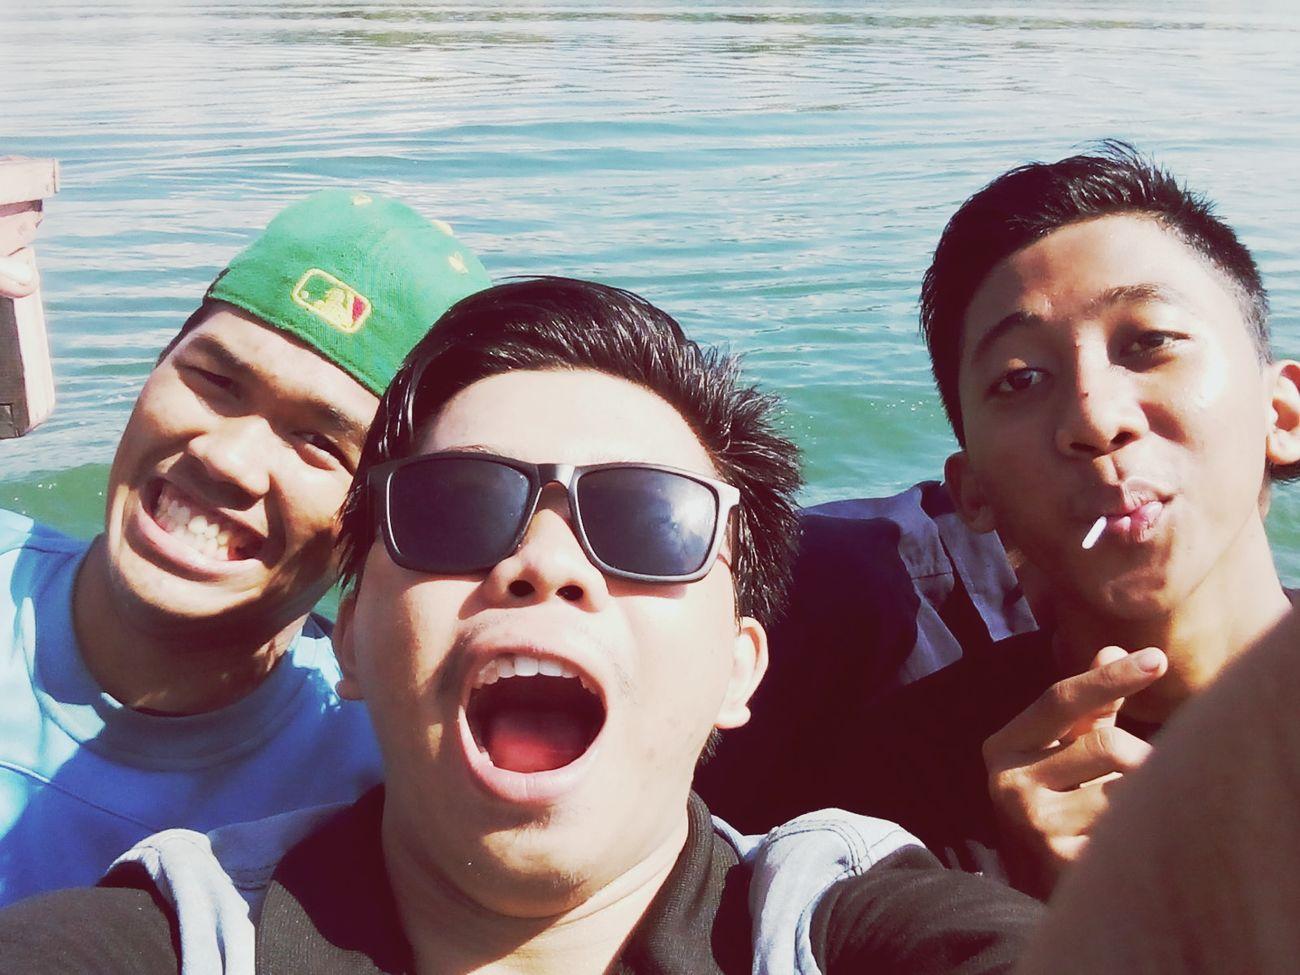 Latepost Hello World Selfie ✌ Riamkanan